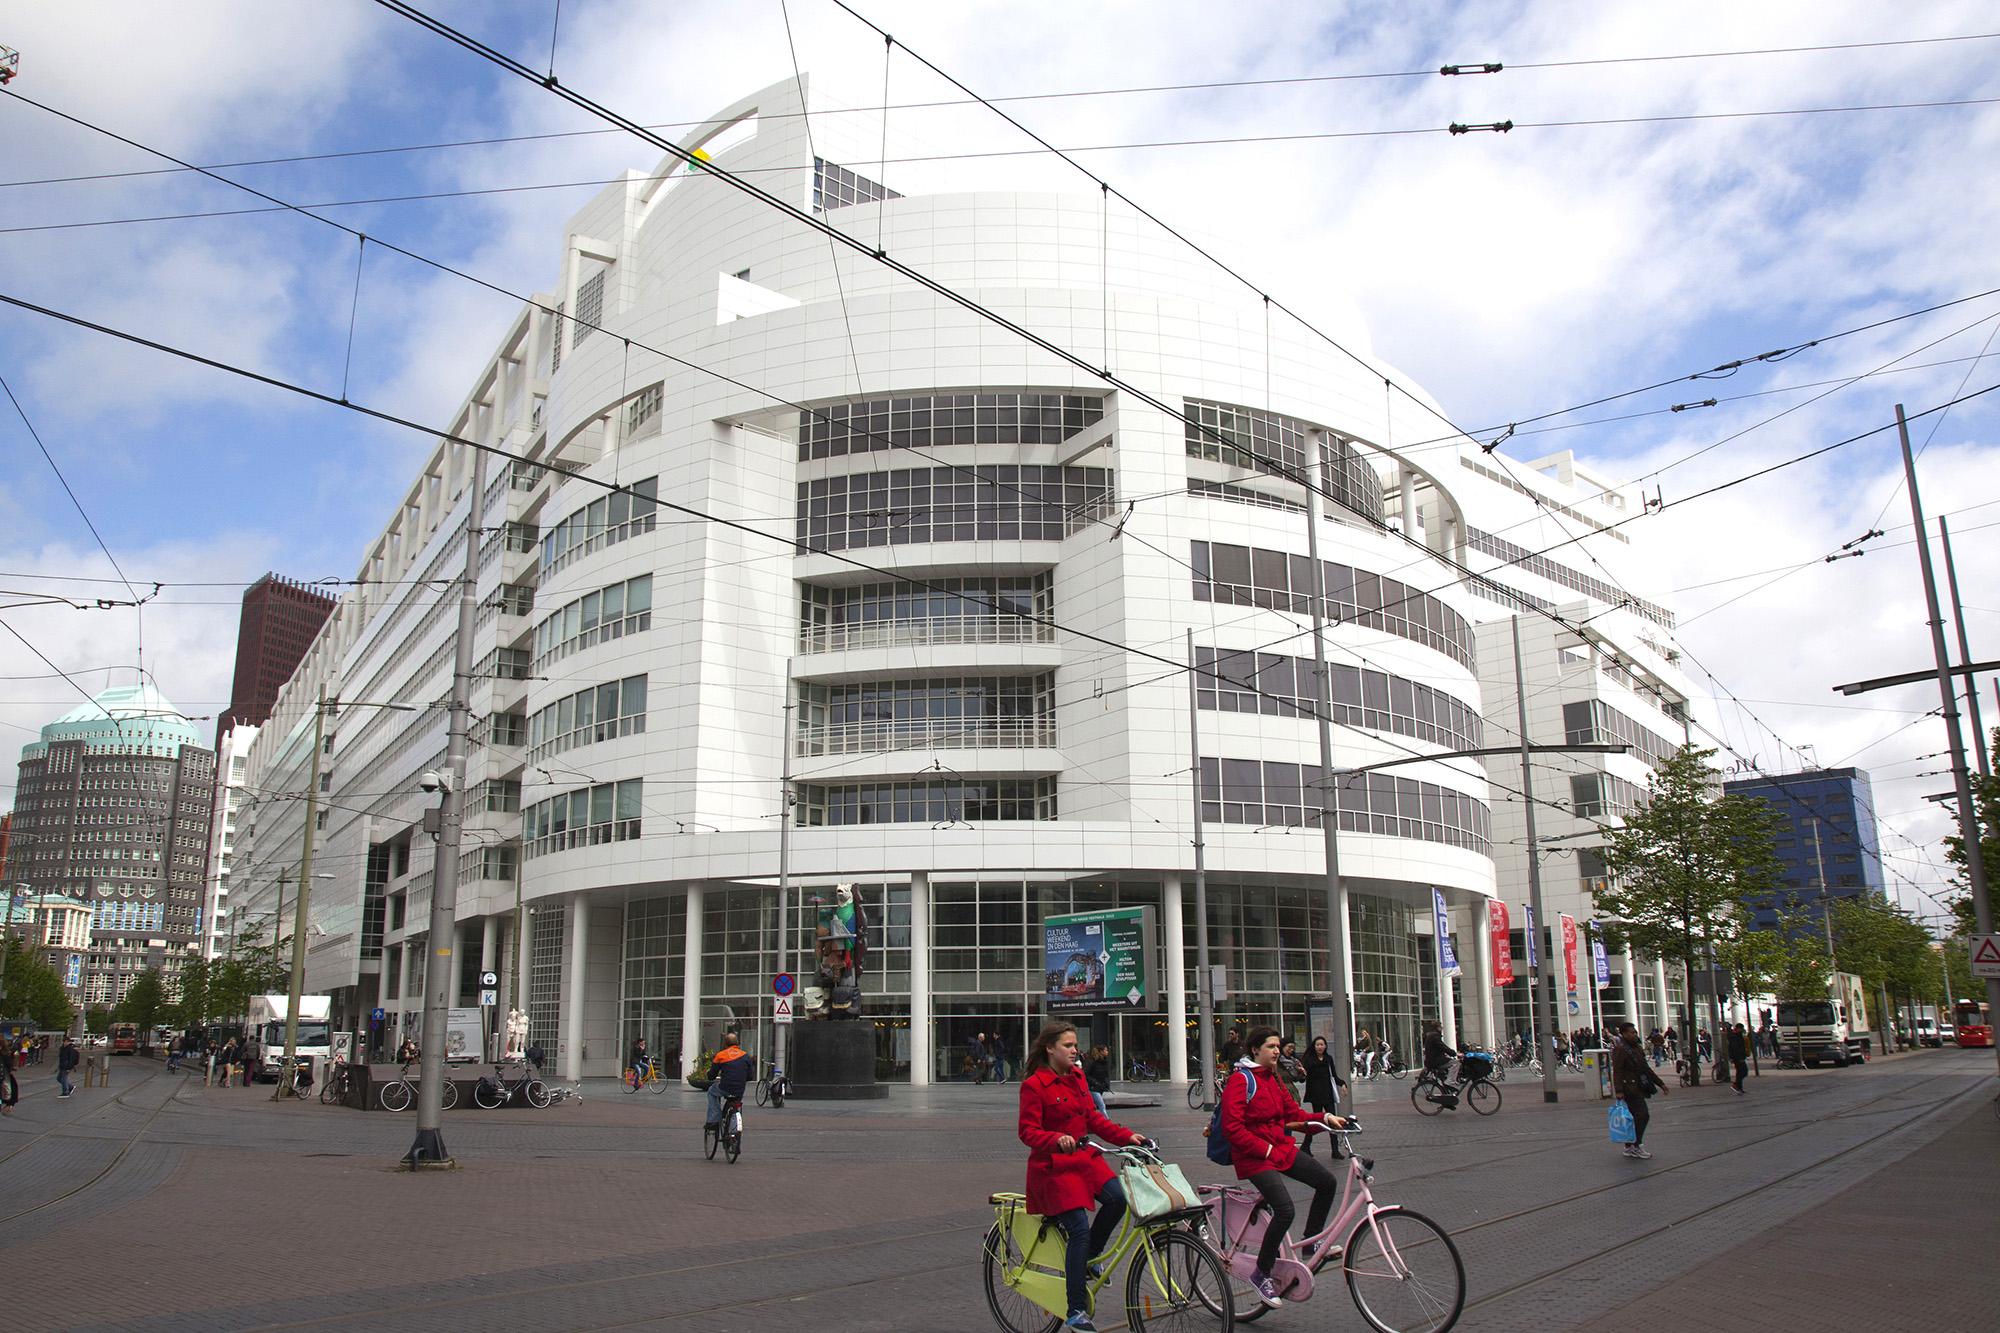 Centrale bibliotheek.JPG (908619 bytes)